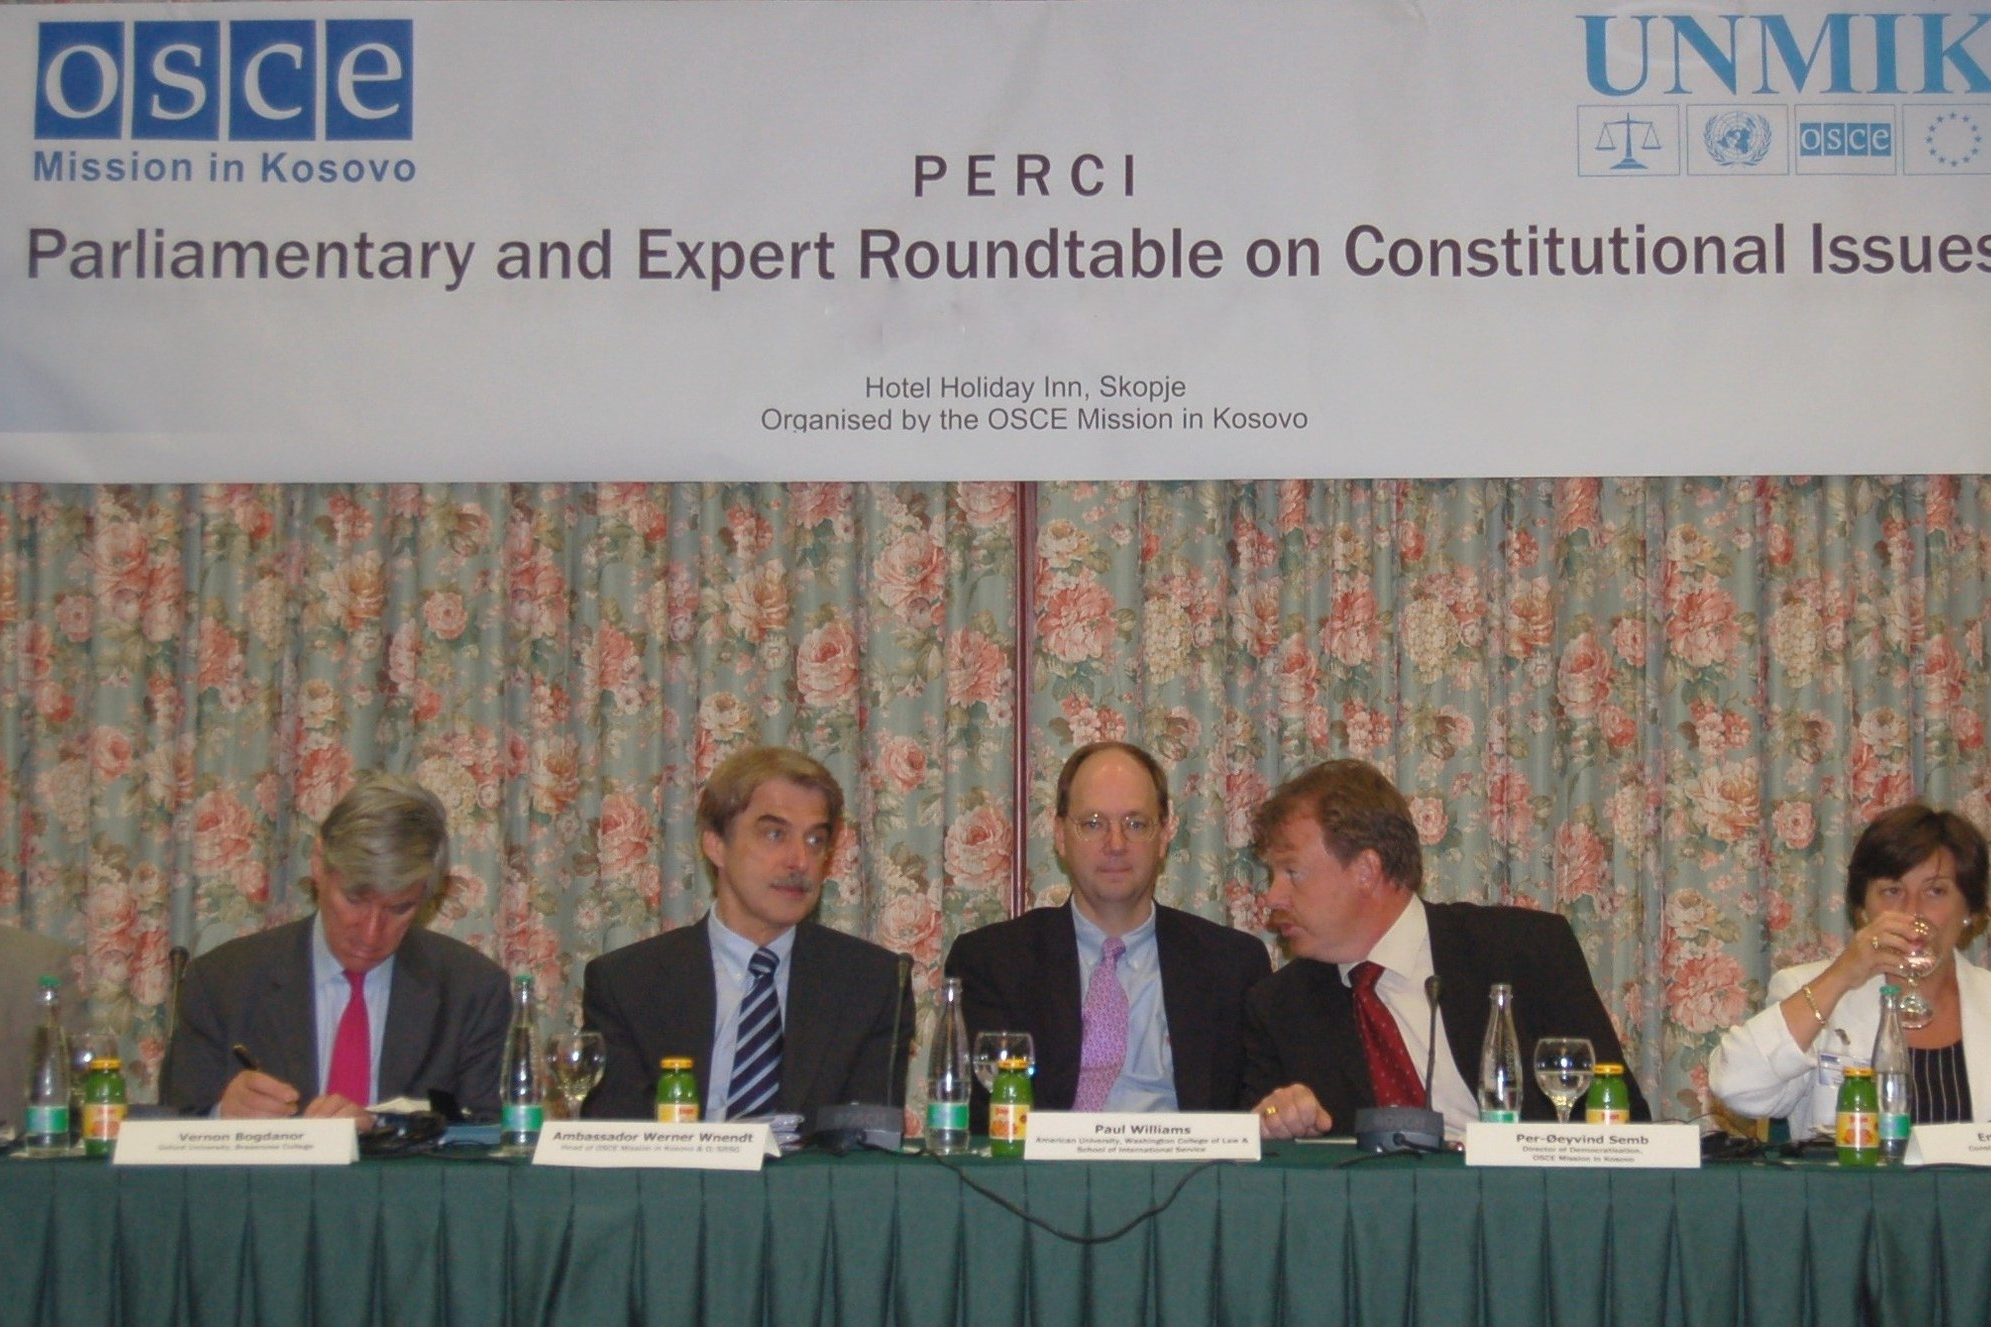 02 Ambassador and Experts(1).JPG